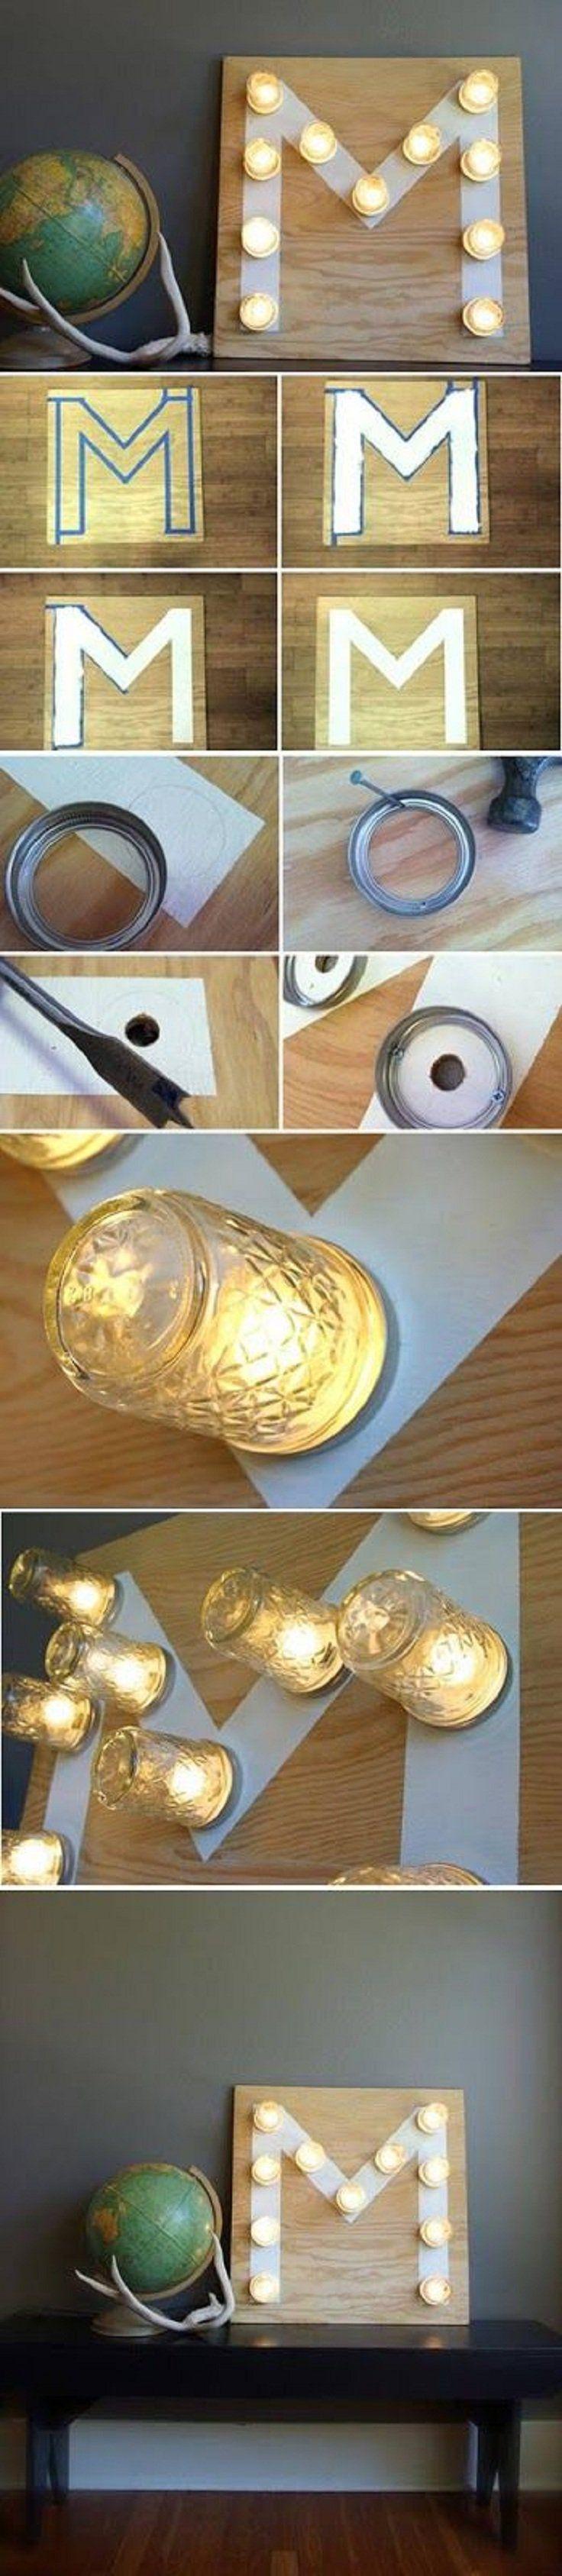 Top 10 Home Decor Diy Ideas - Jar Lights, Holiday